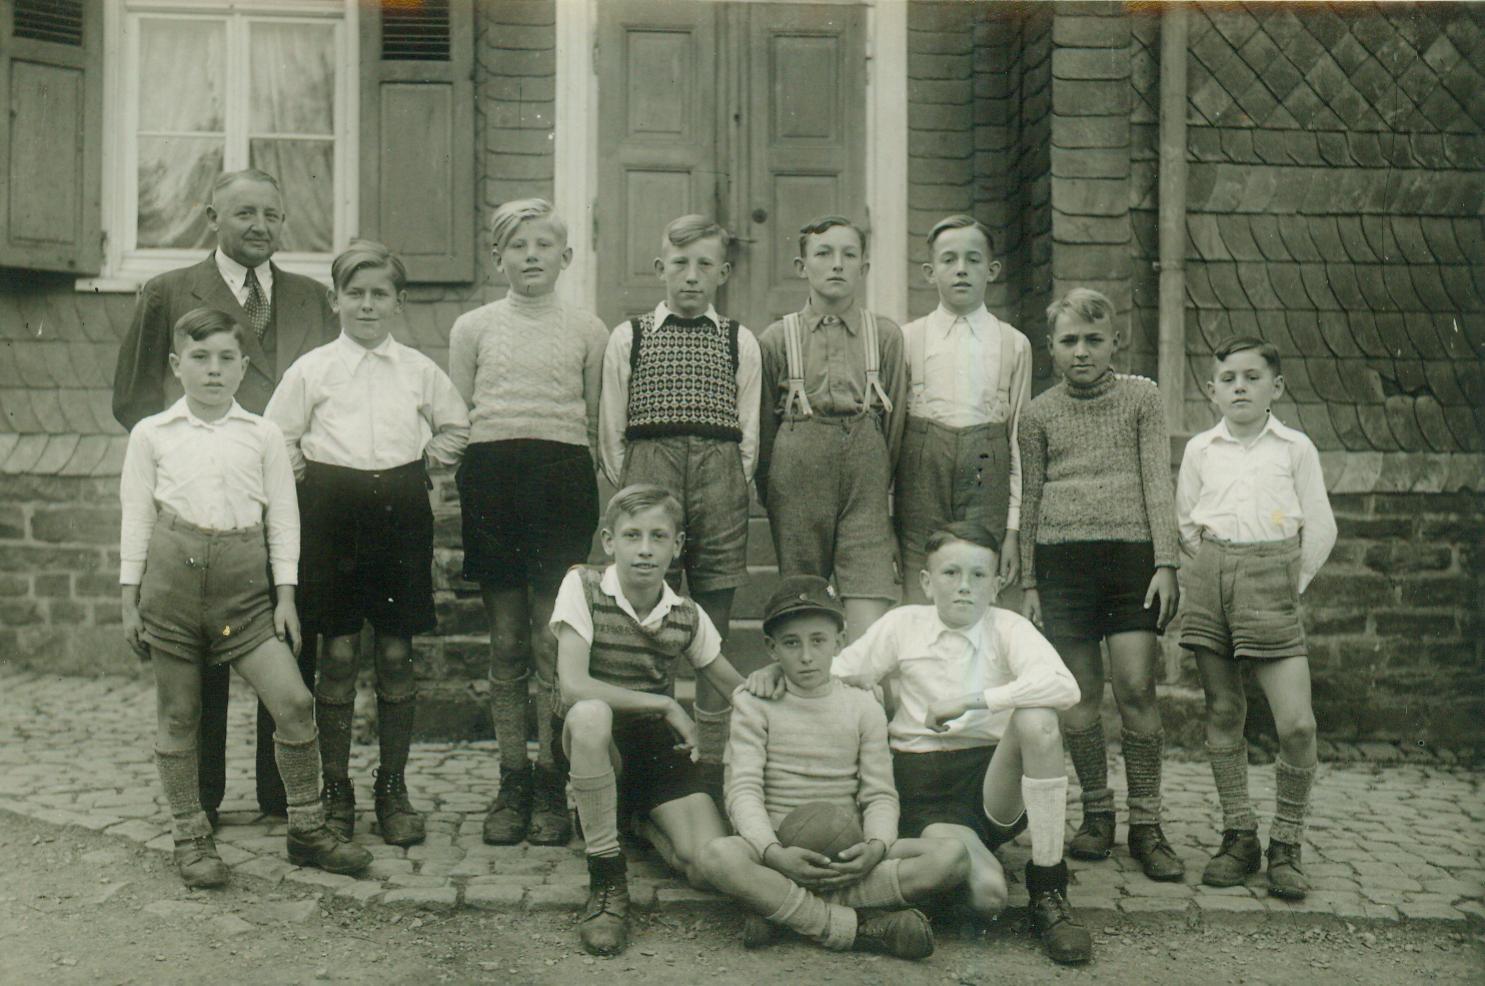 Obernauer Fußballer